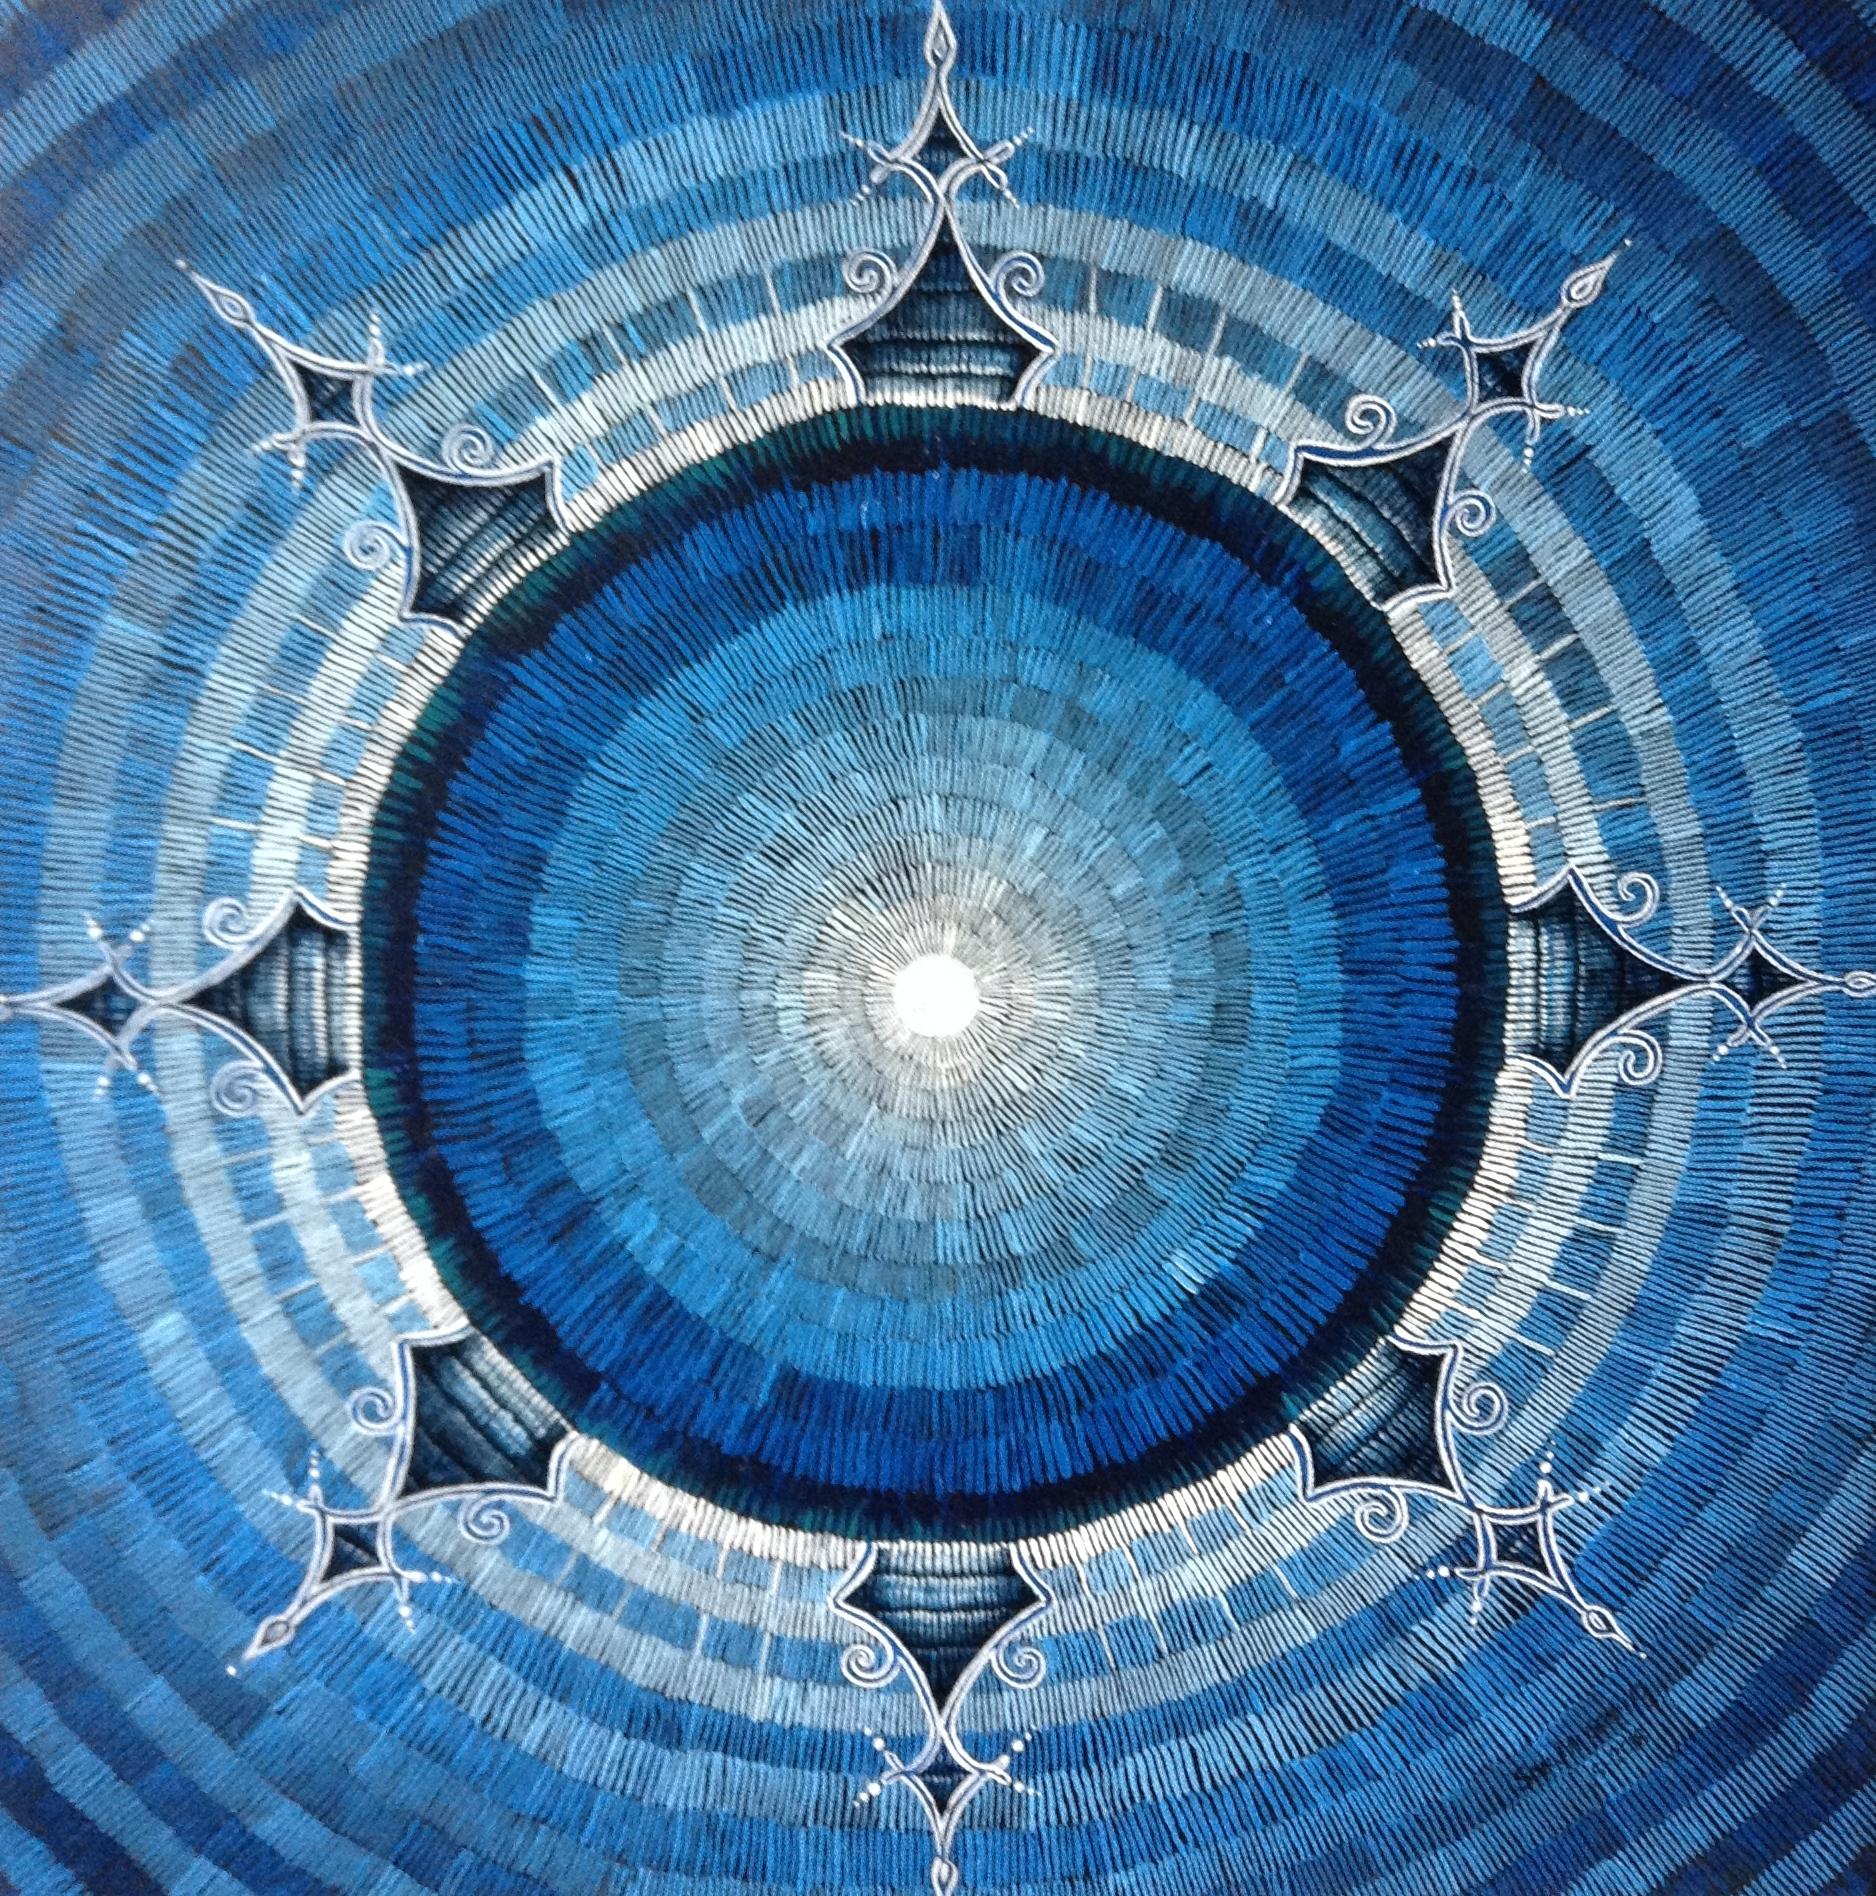 #461 - Untitled Mandala (Fibrous Series), oil on canvas 20x20, April 2018 (4)